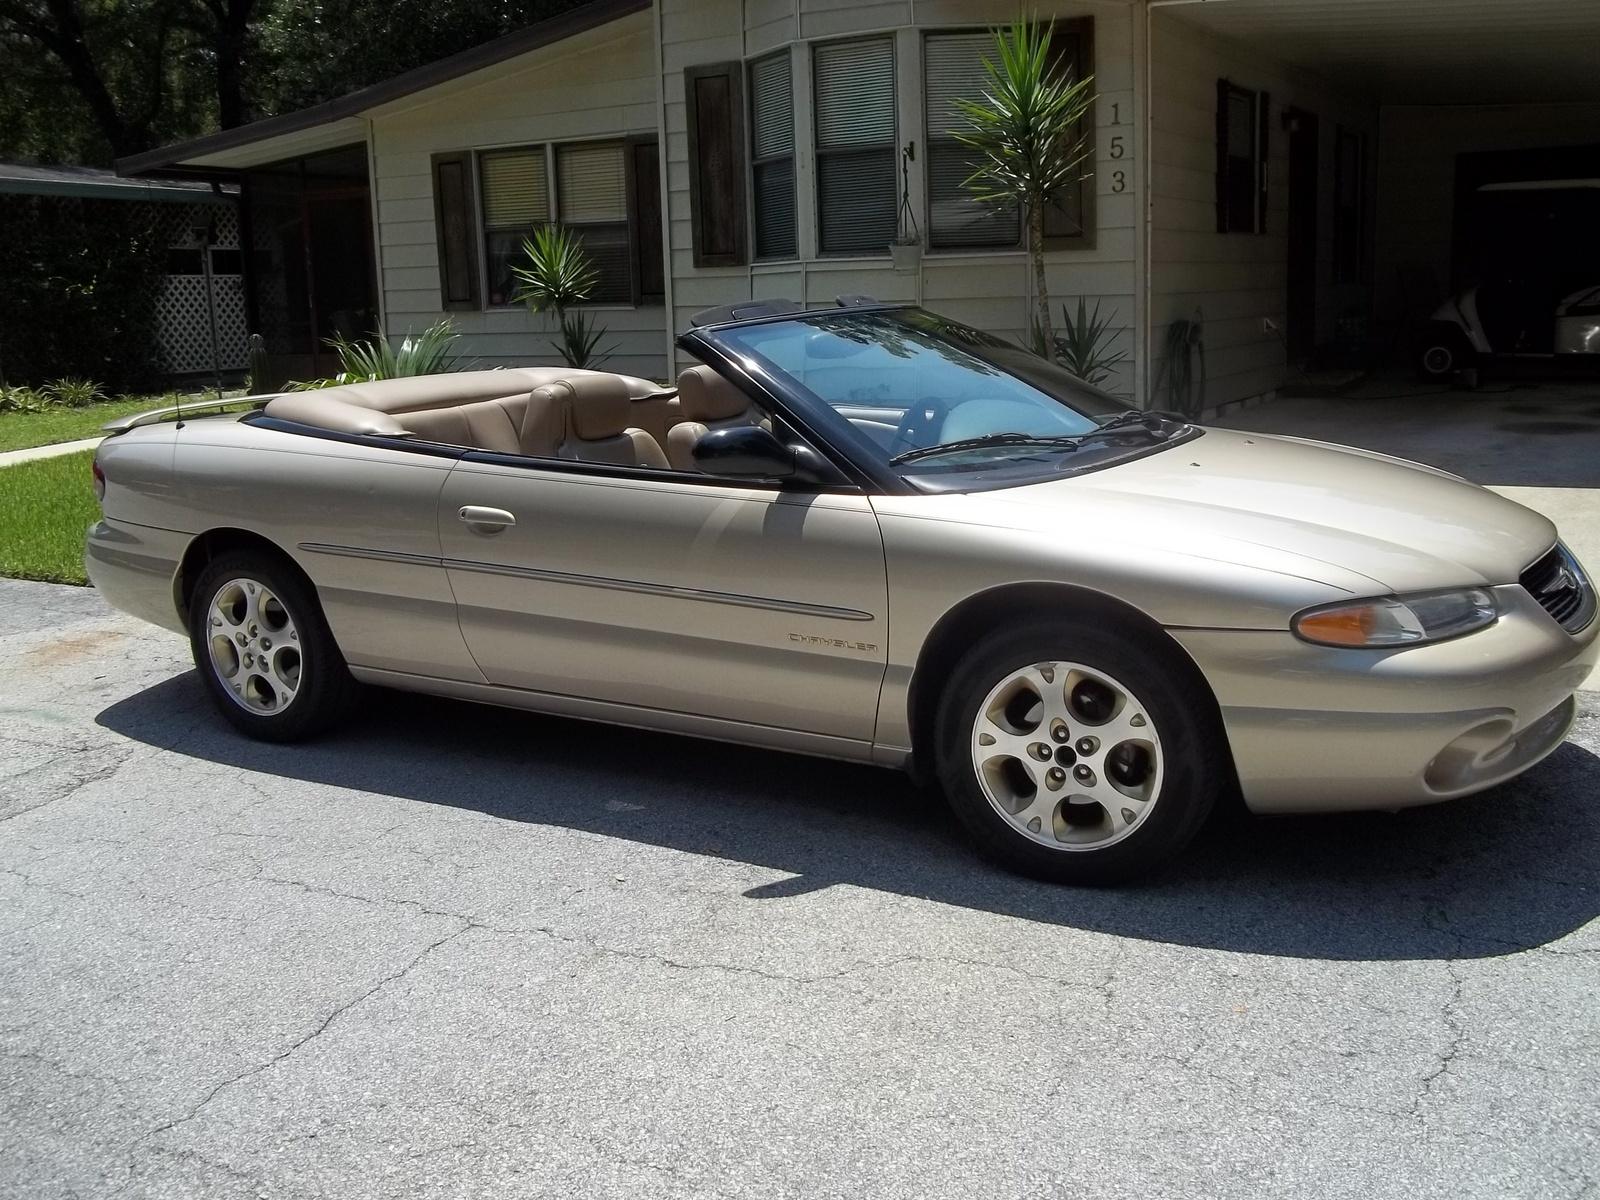 2000 Chrysler Sebring Exterior Pictures Cargurus